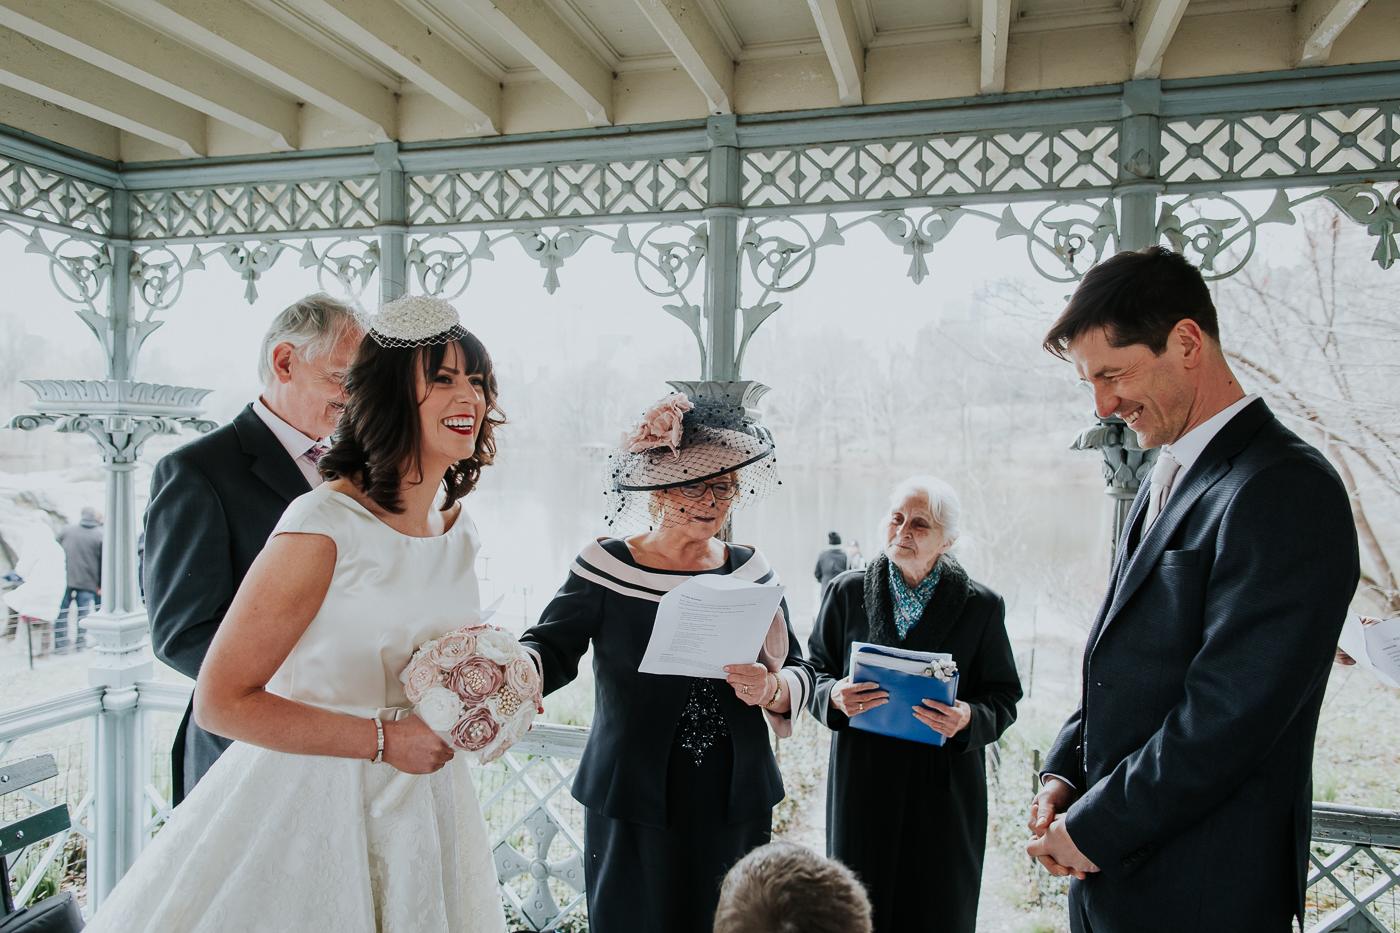 Ladies-Pavilion-Central-Park-NYC-Documentary-Elopement-Wedding-Photographer-24.jpg